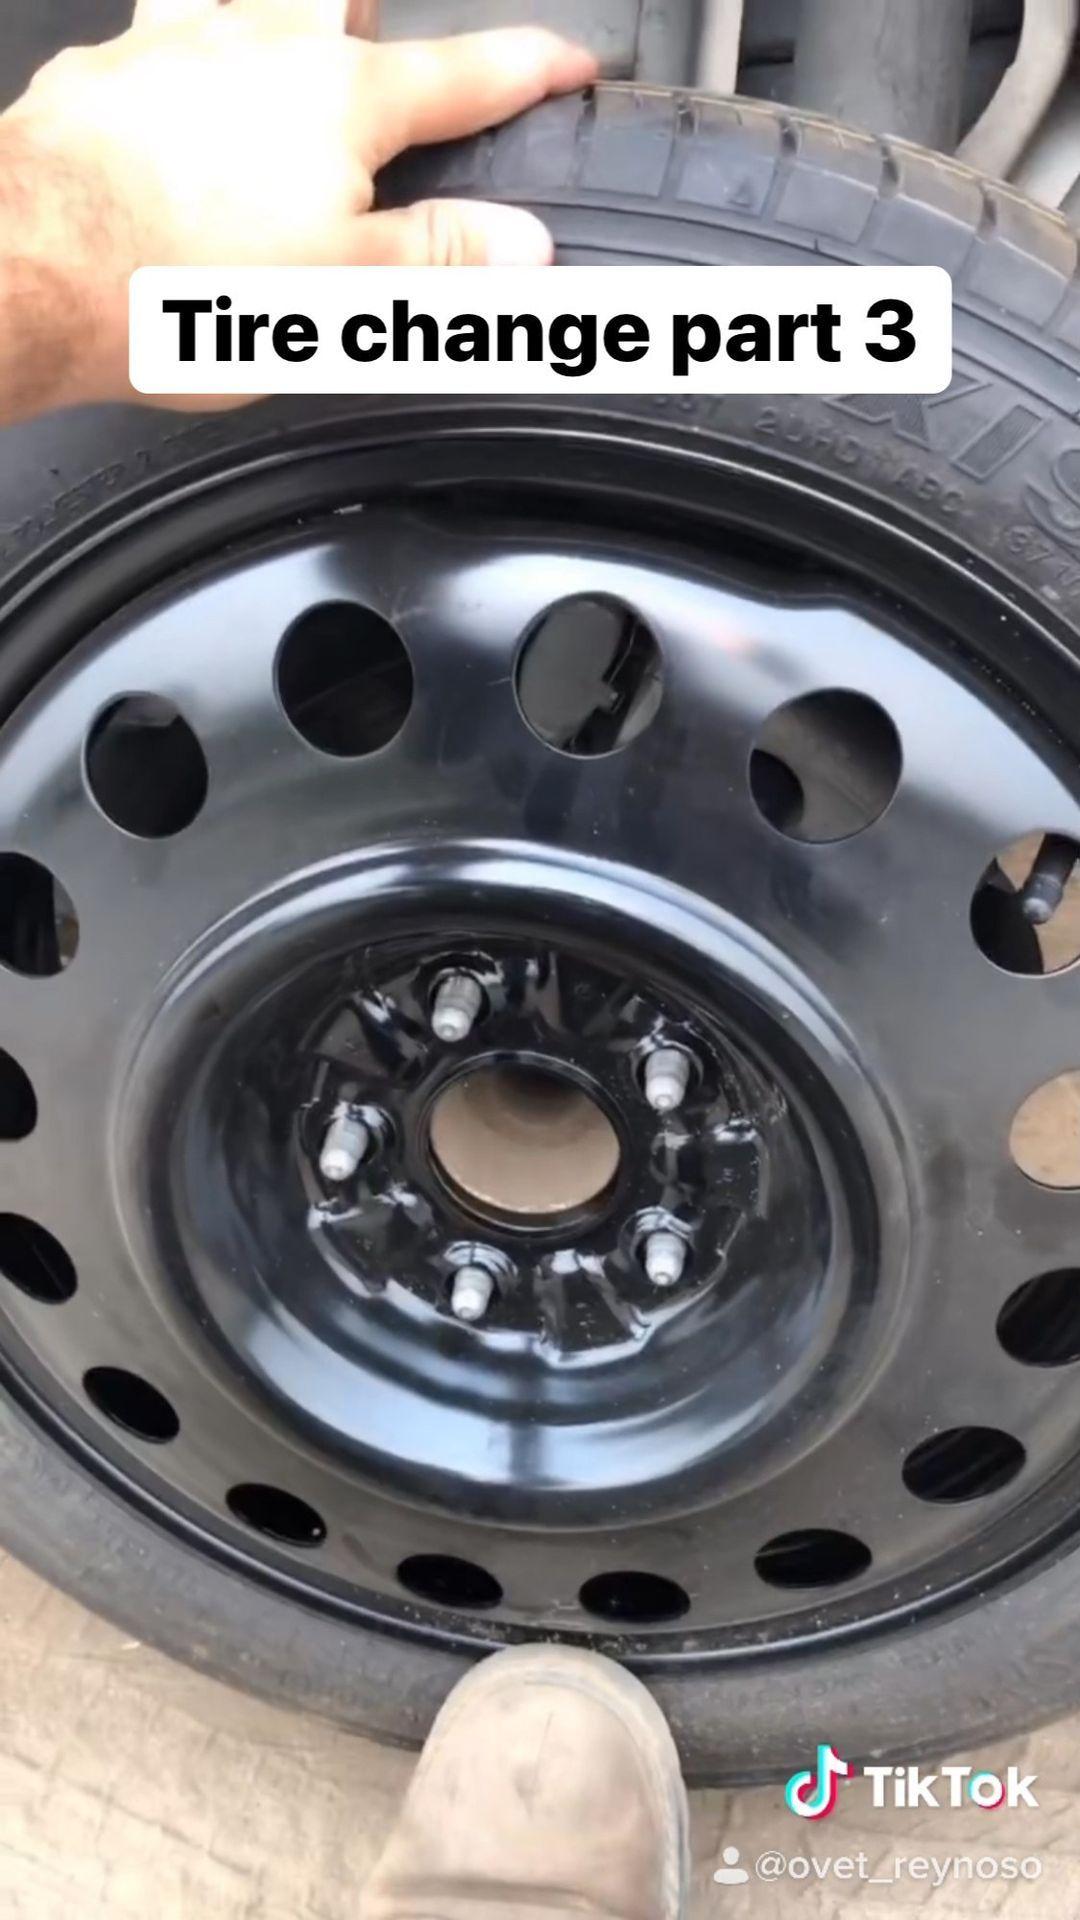 Ovet Reynoso On Instagram Tire Change Part 3 In 2020 Tire Change Tire Instagram